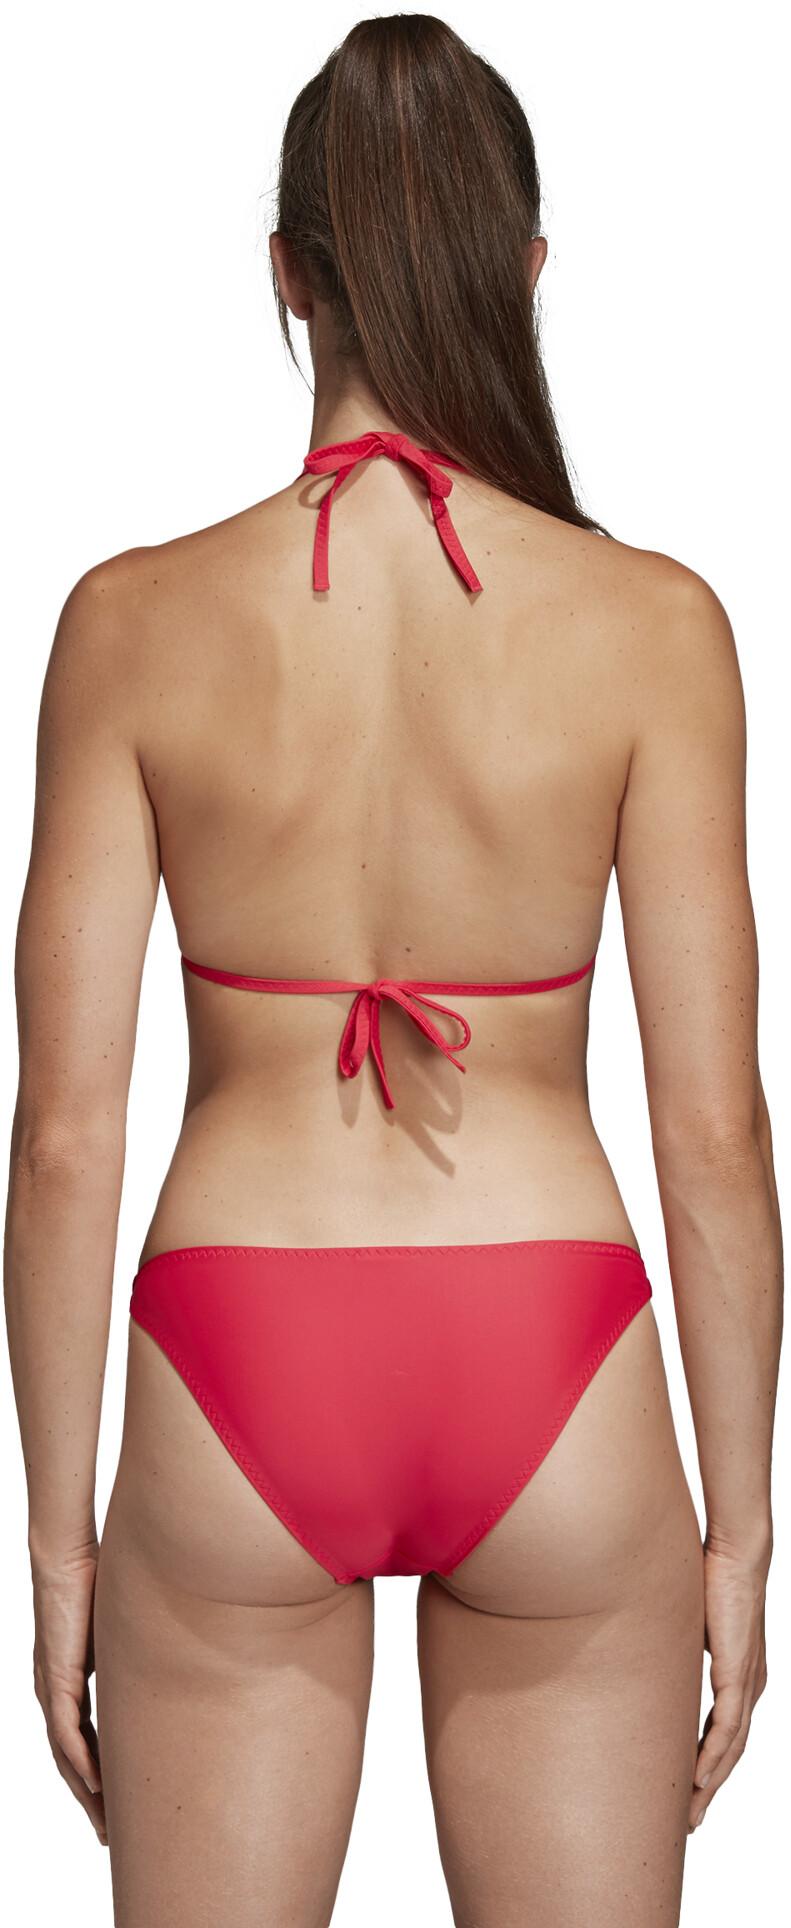 8eeb5868bb4cd5 adidas BW Sol bikini Dames roze I Eenvoudig online bij Bikester